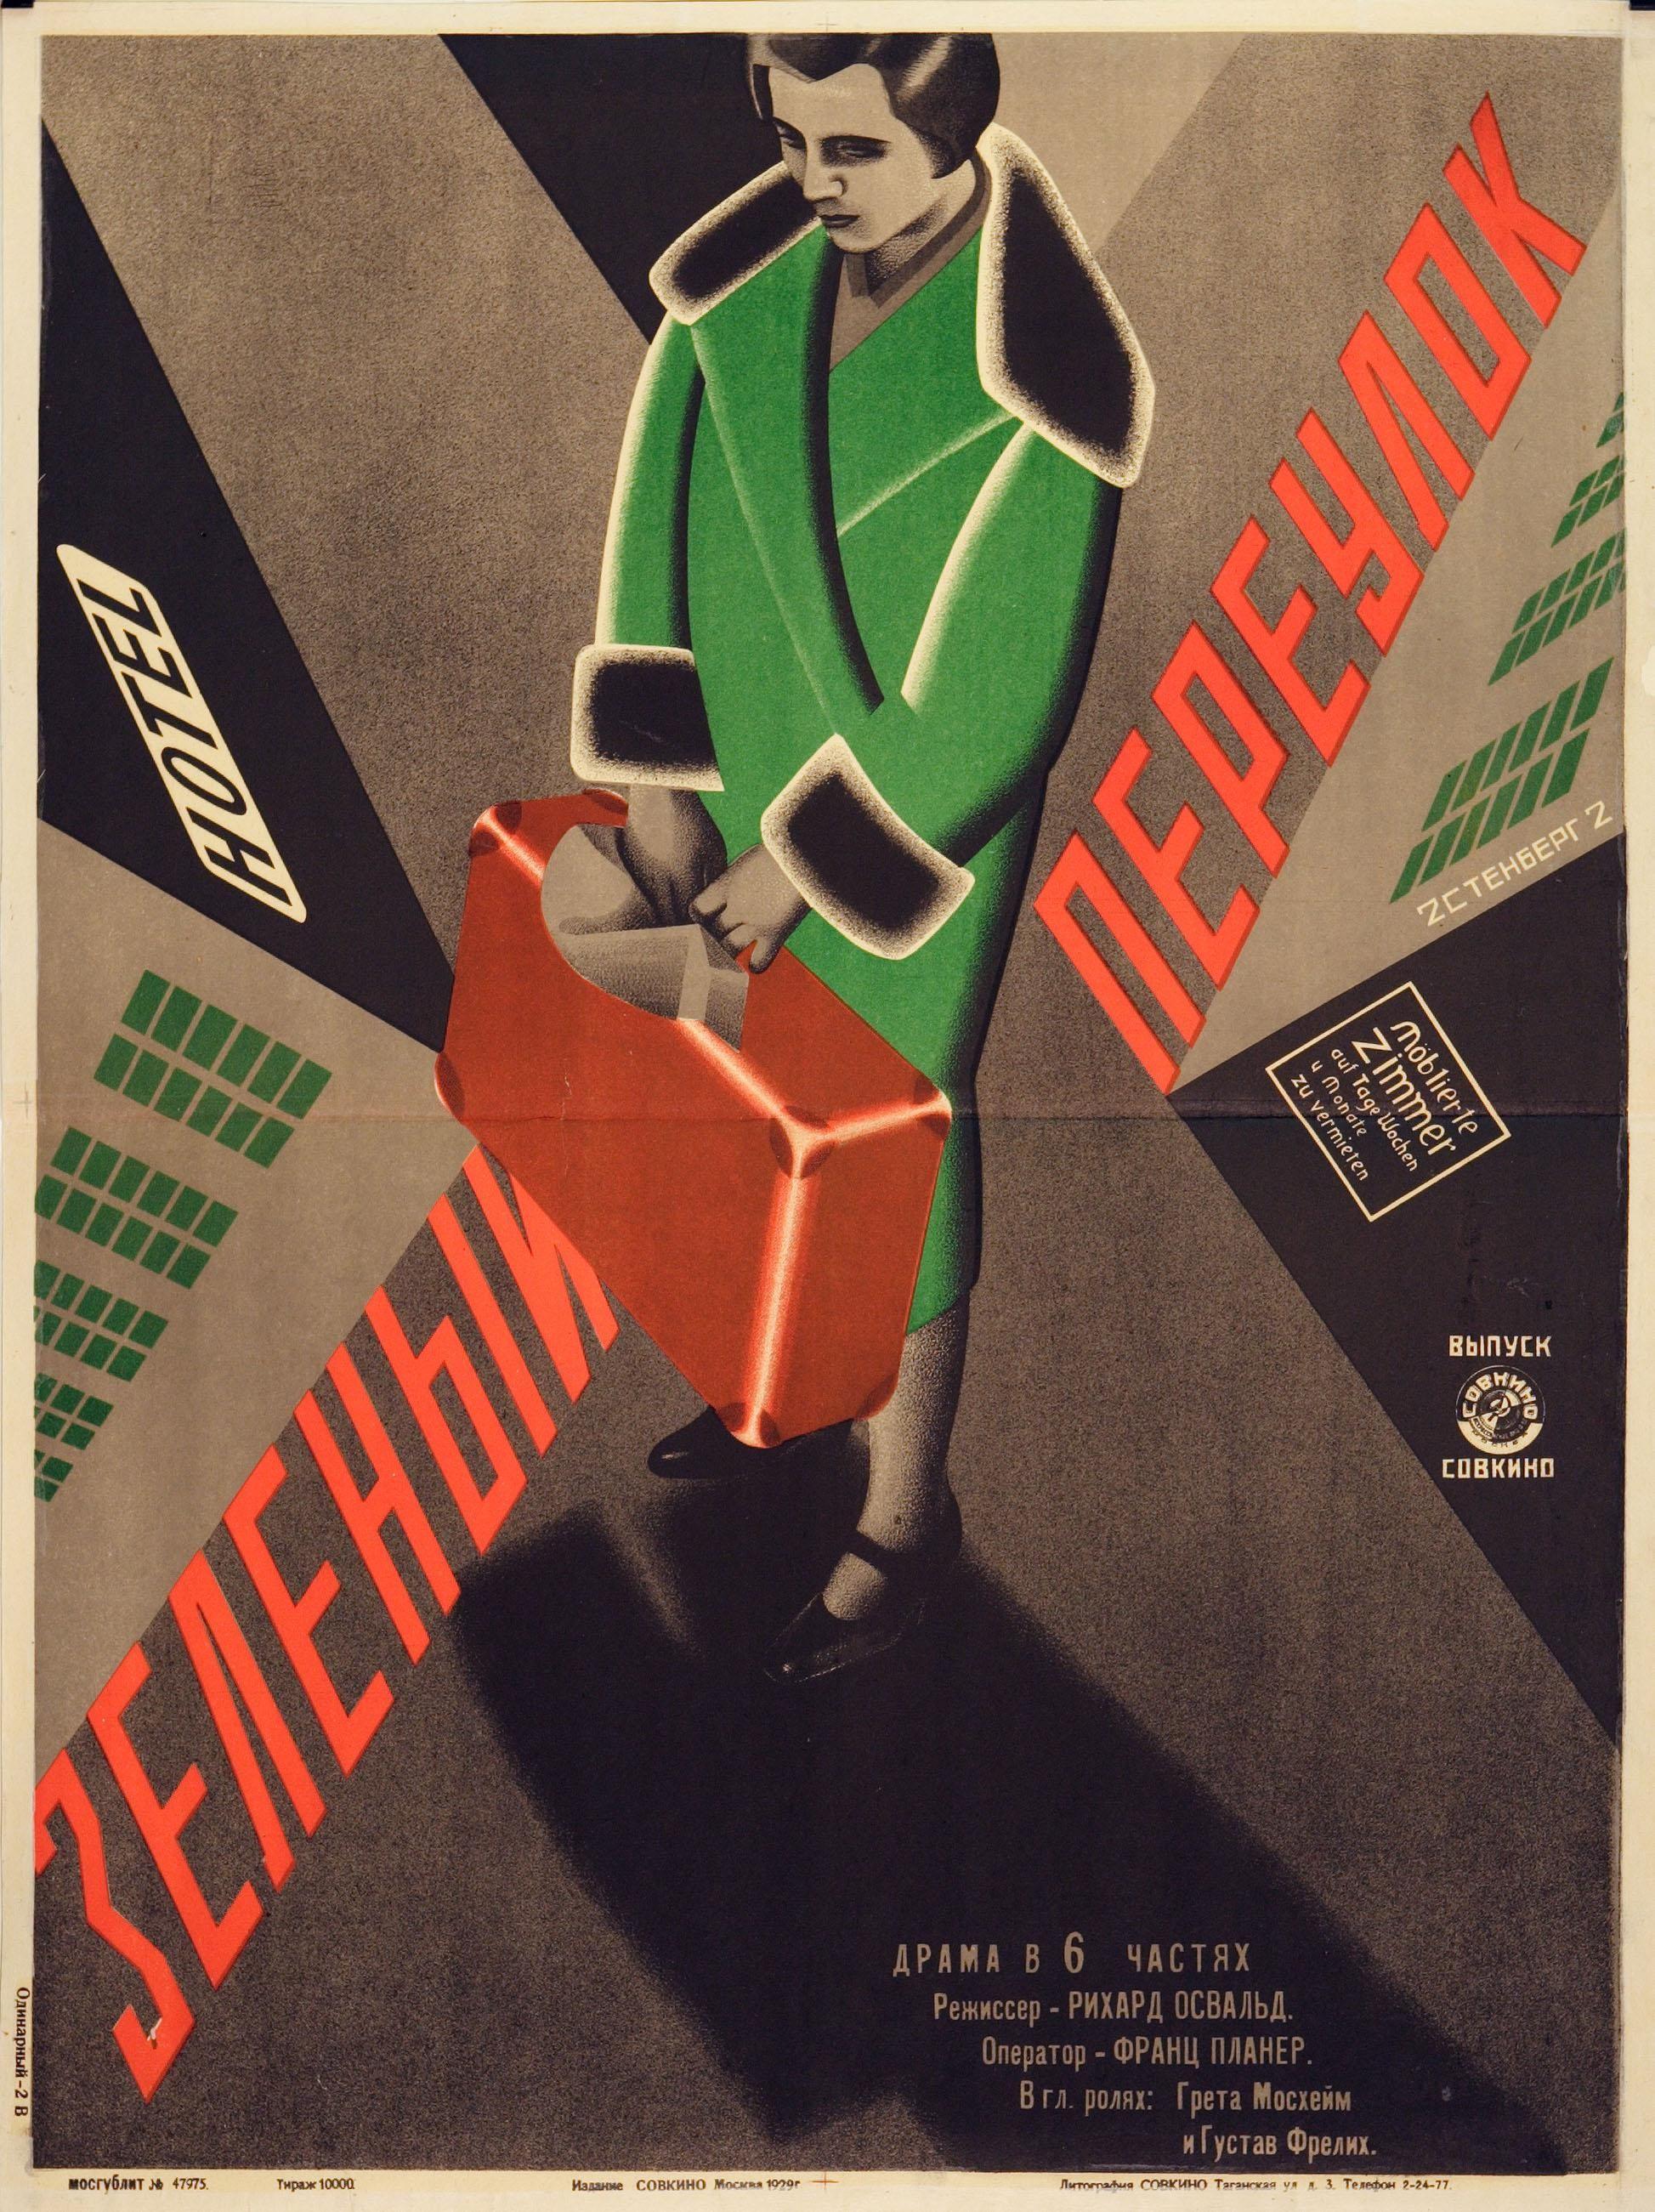 1920 vladimir lebedev propaganda poster MAN MUST WORK BUT RIFLE NEARBY 24X36